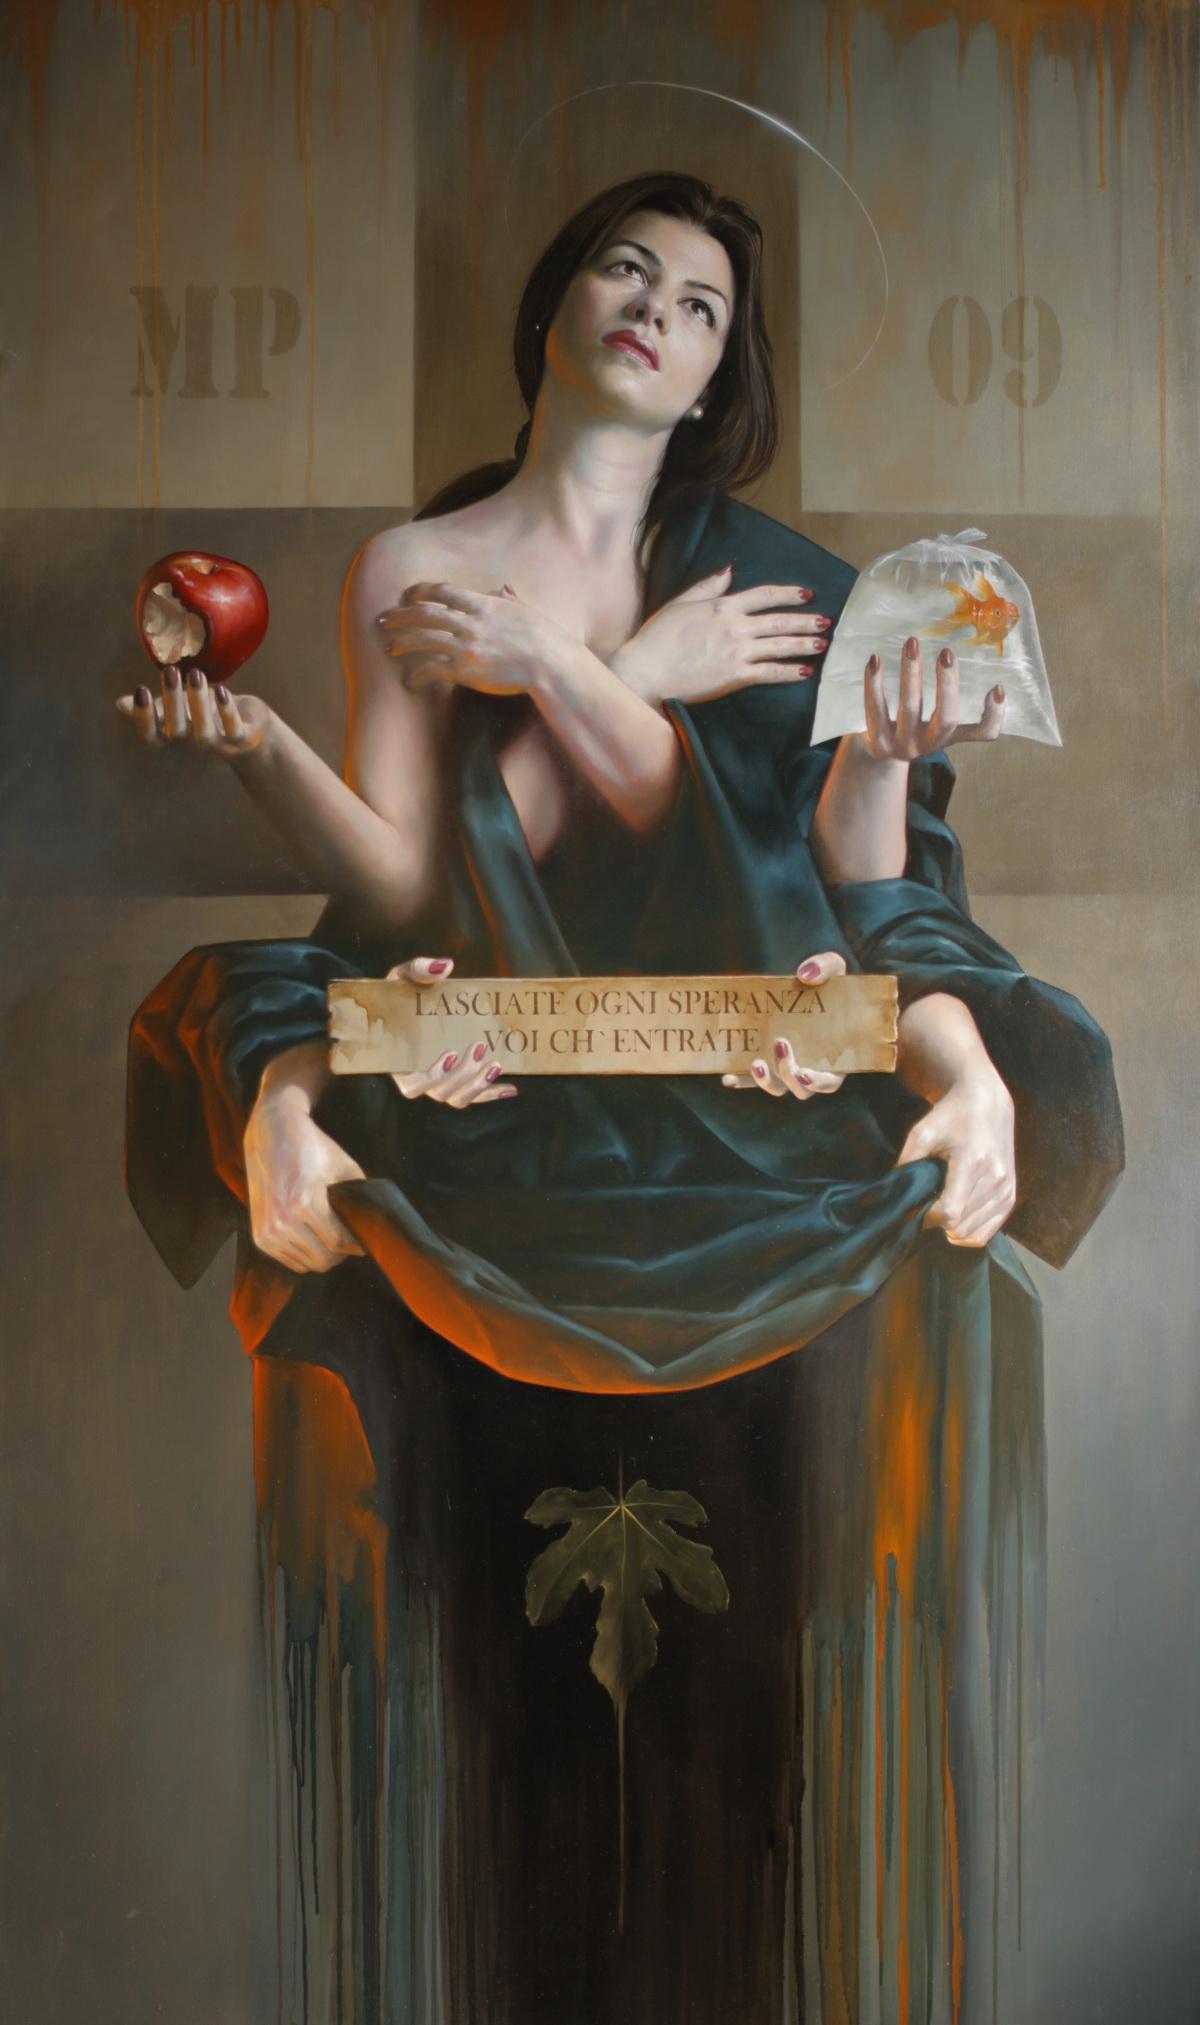 SPERANZA / Oil on canvas /114x195 cm